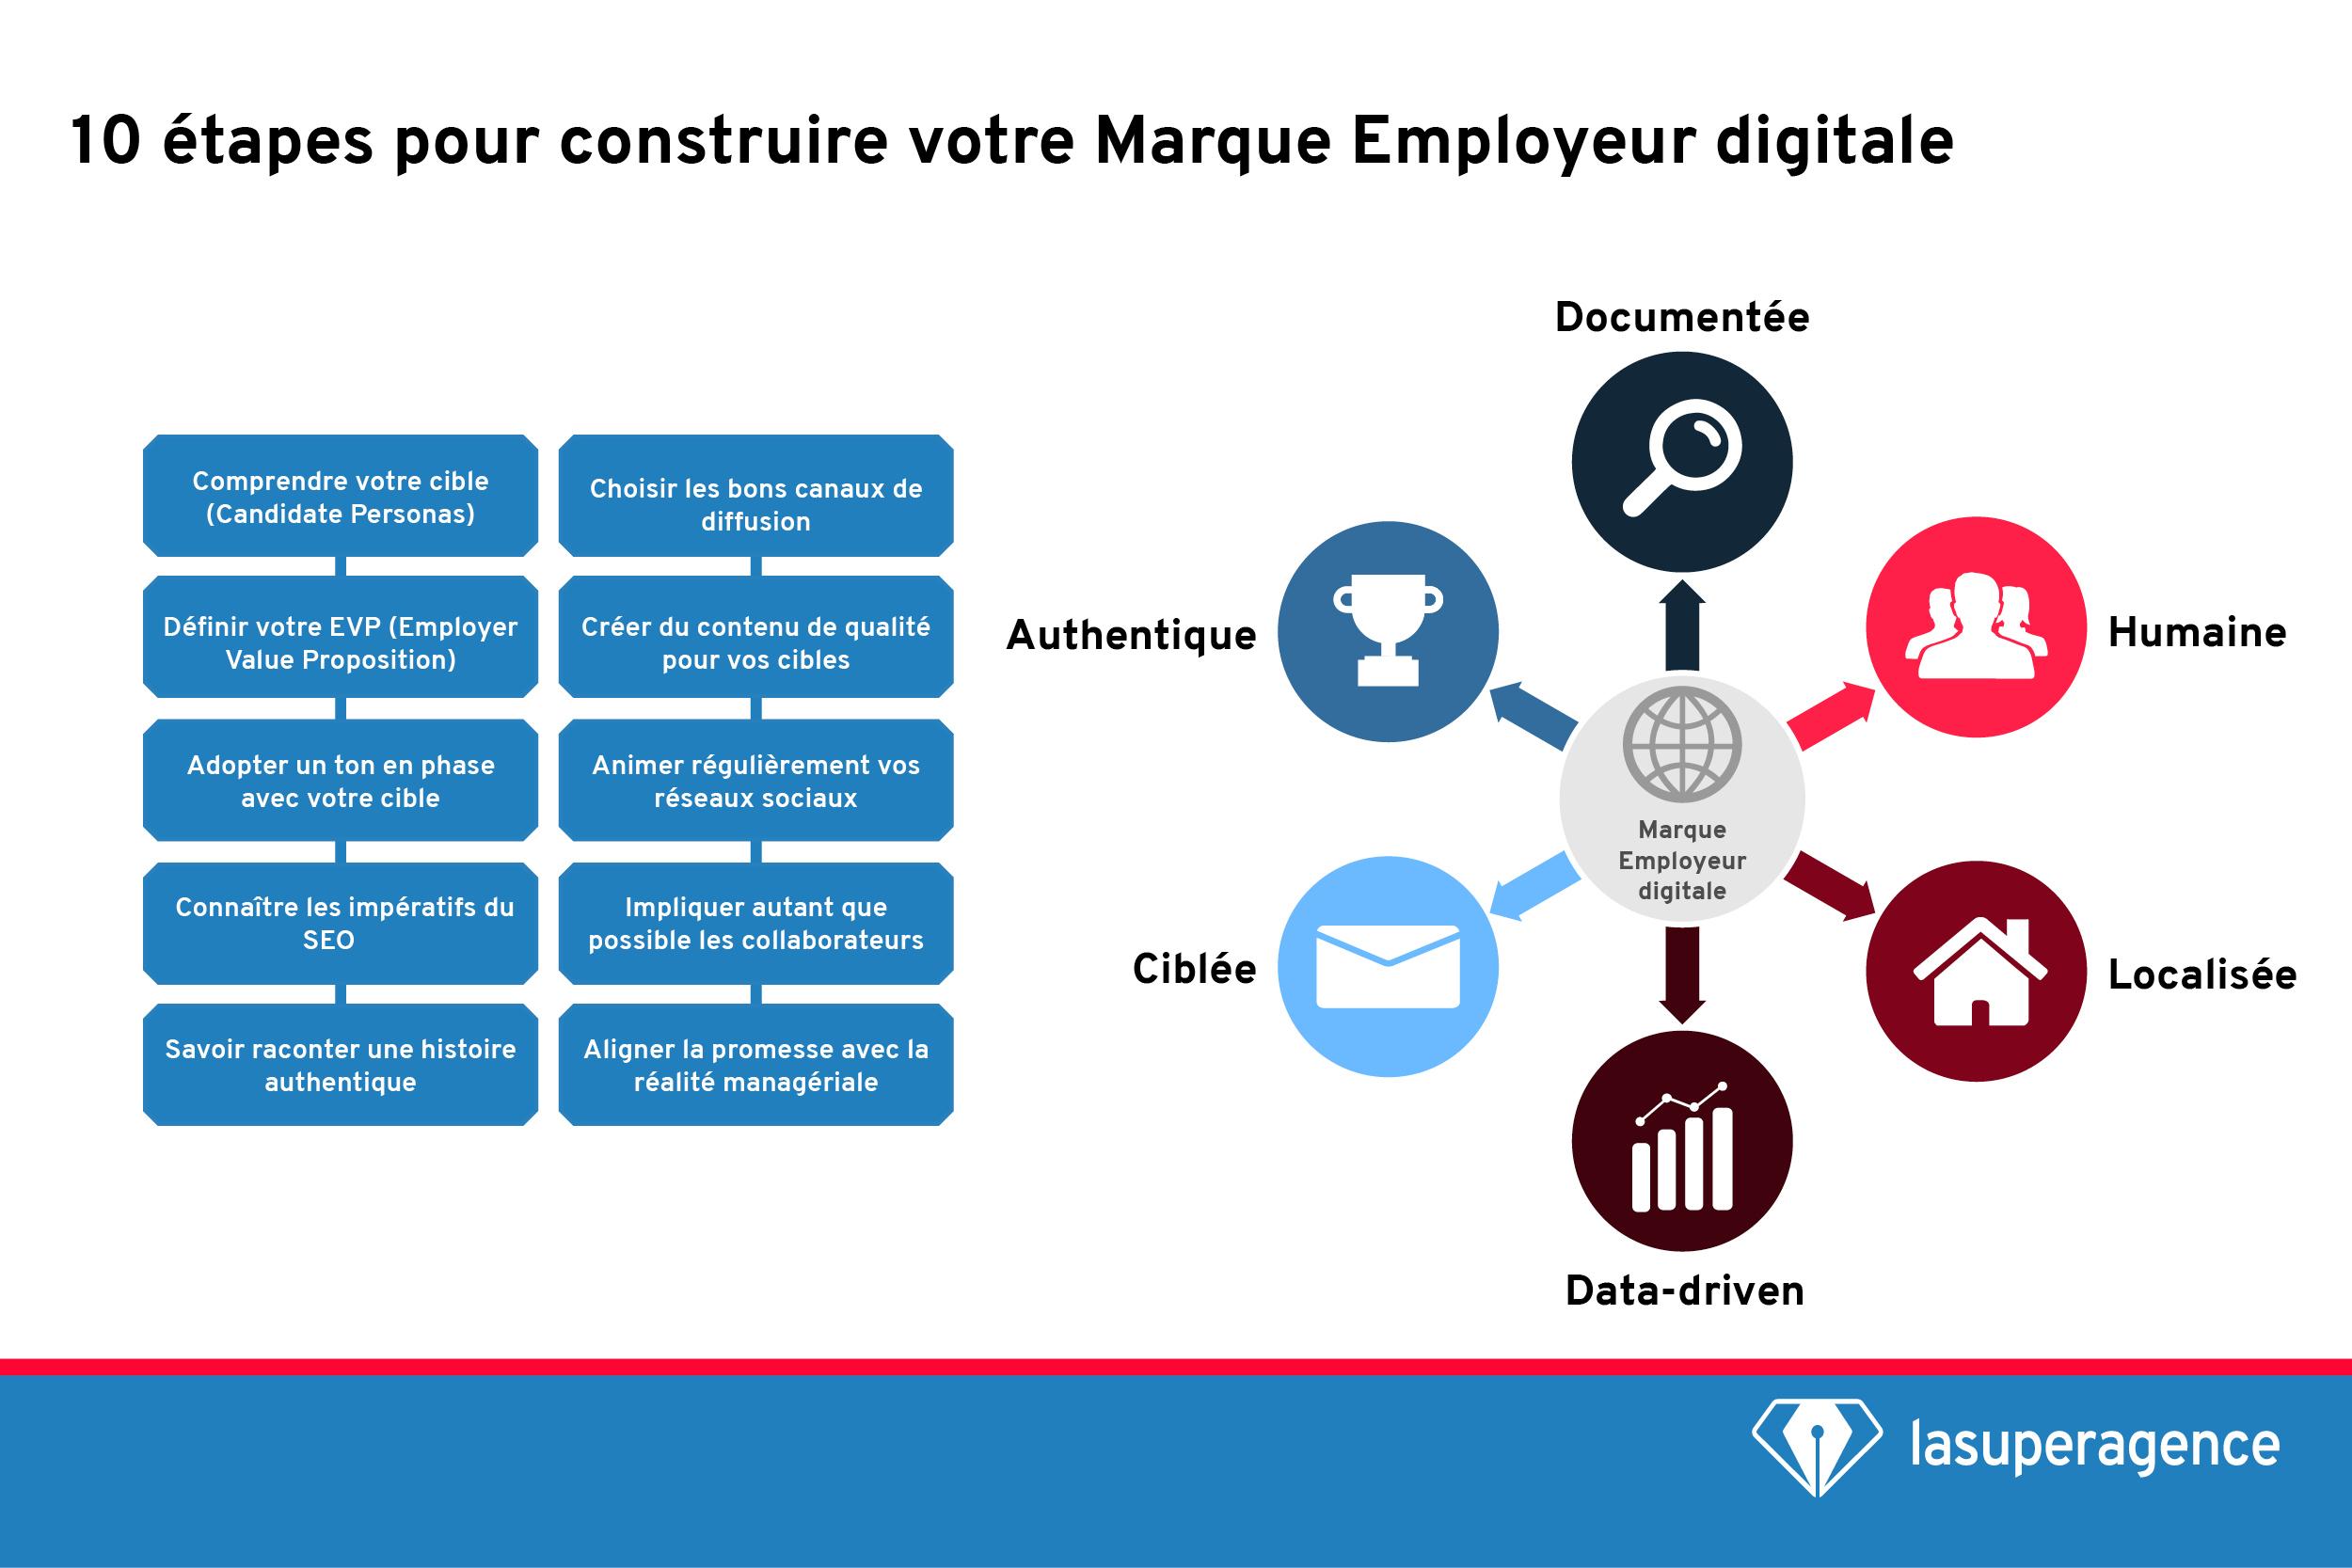 Marque Employeur digitale